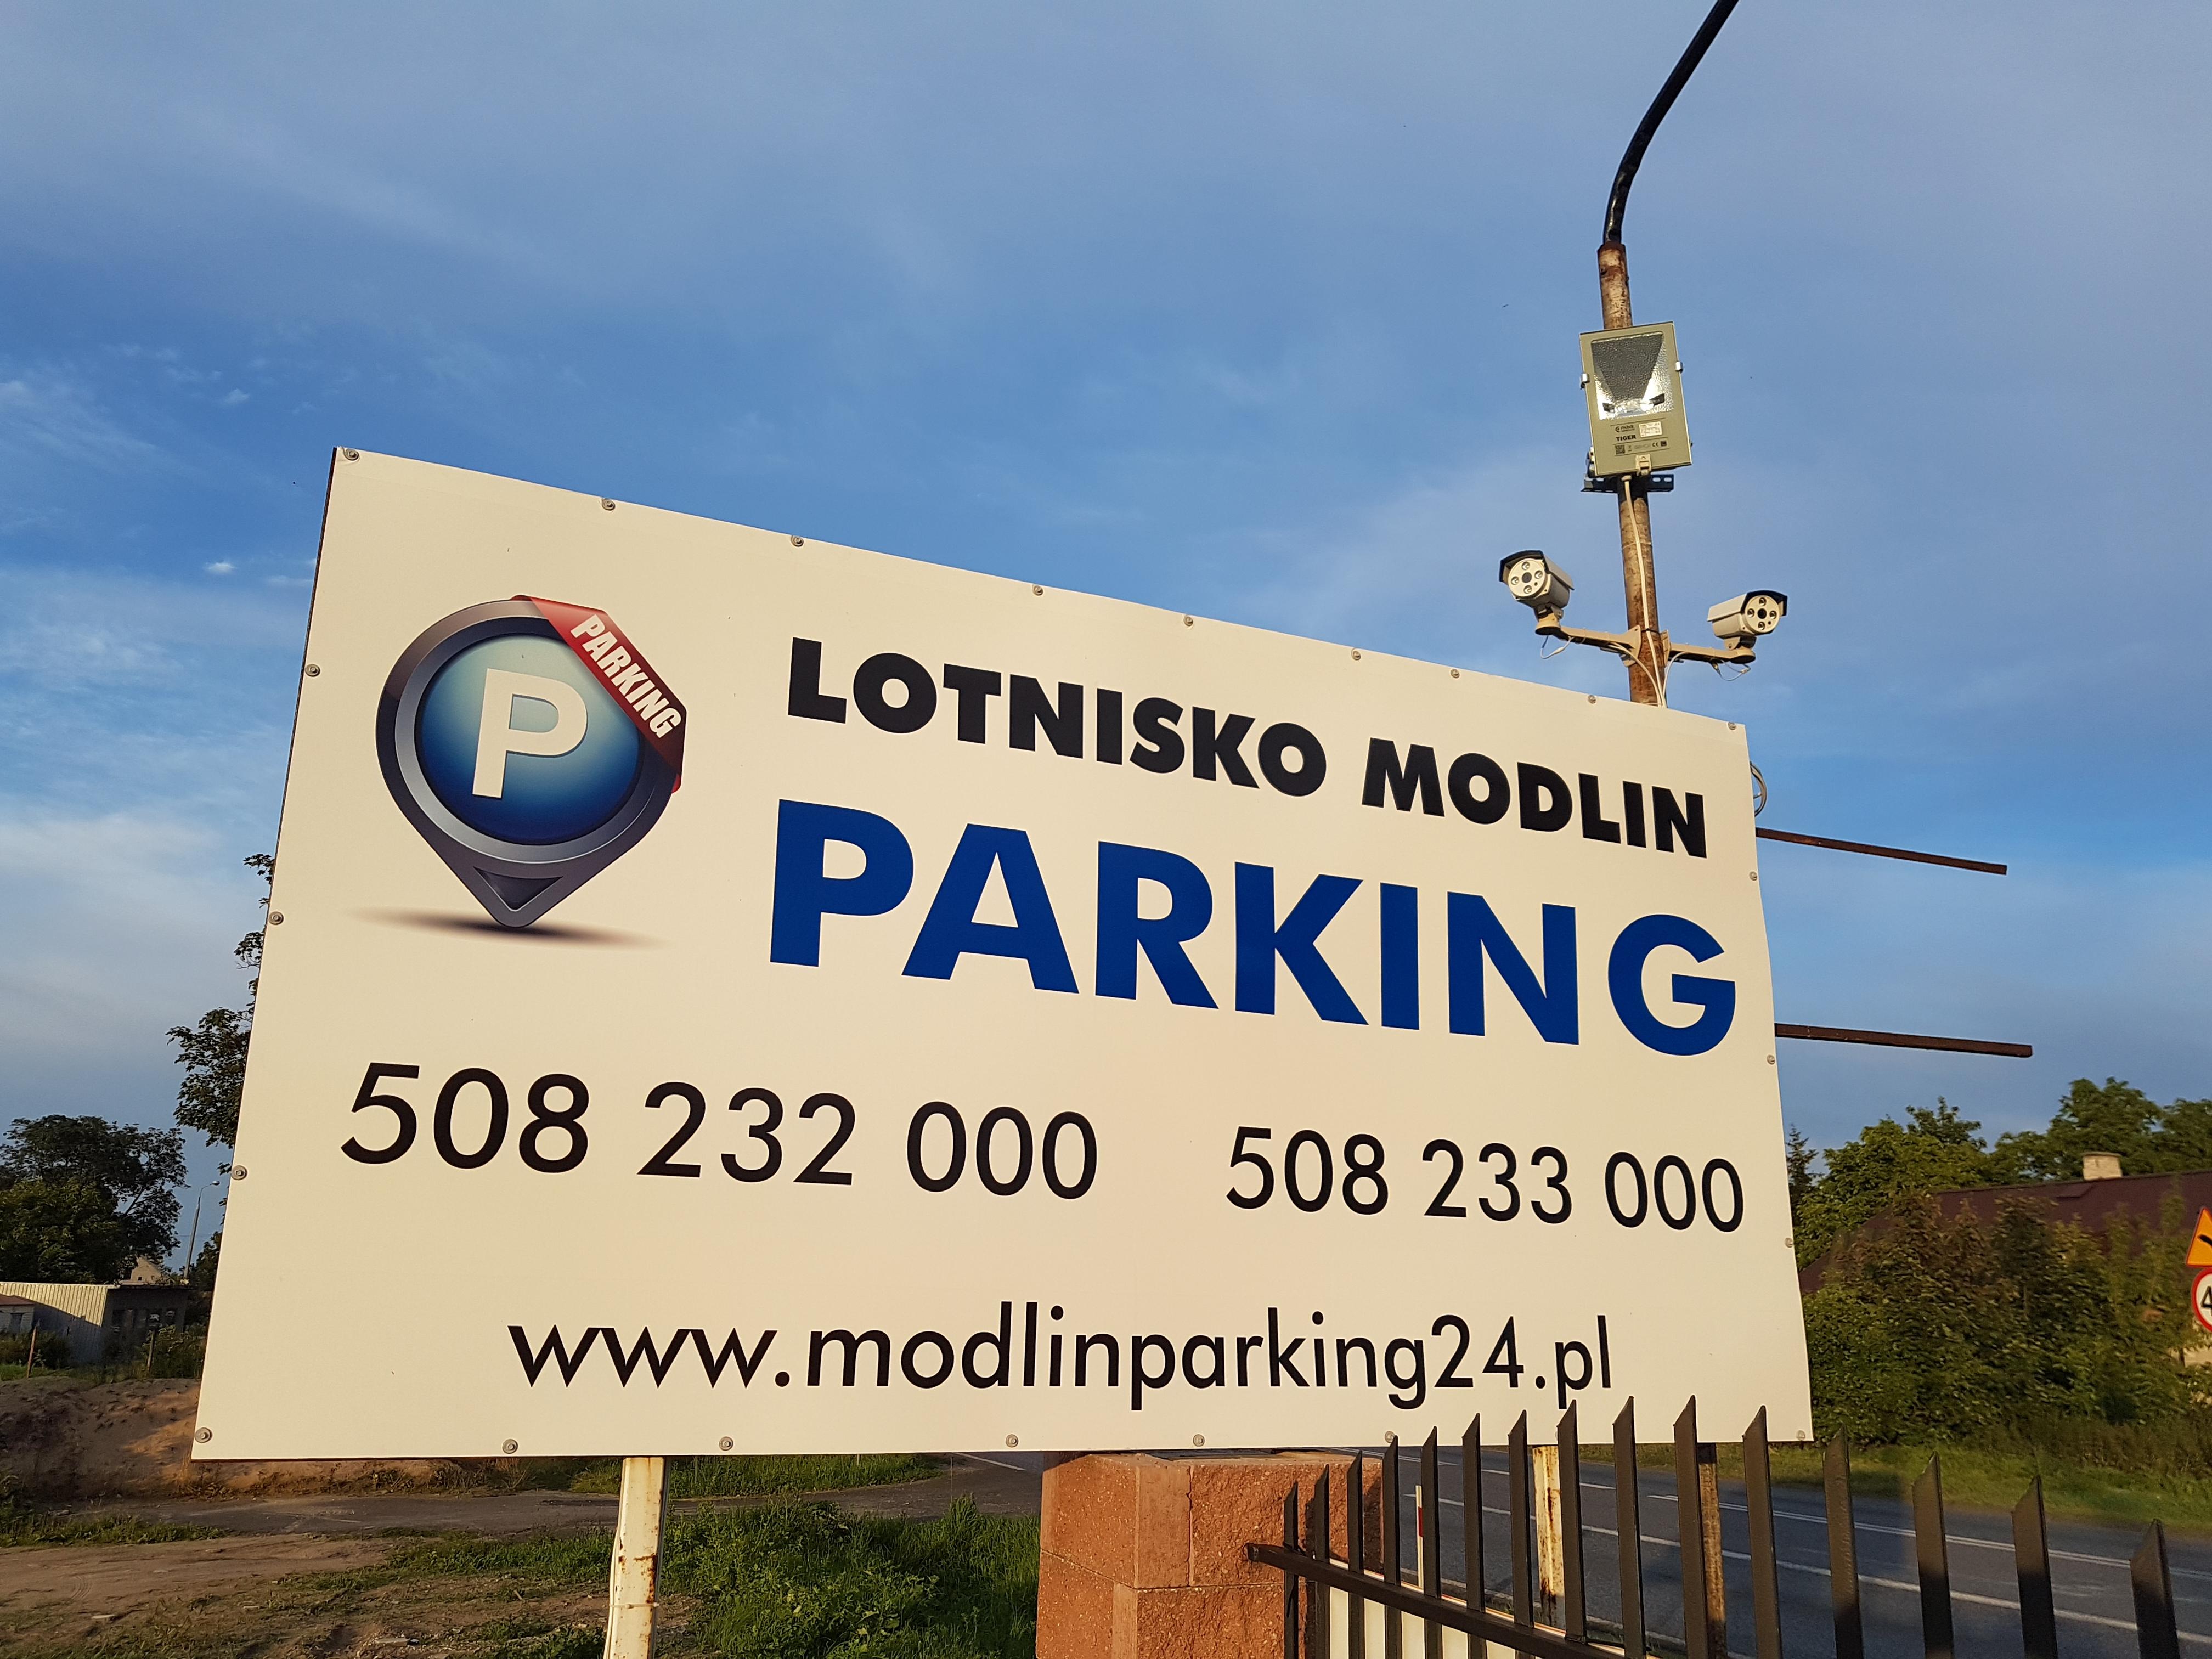 Parking Modlin P24